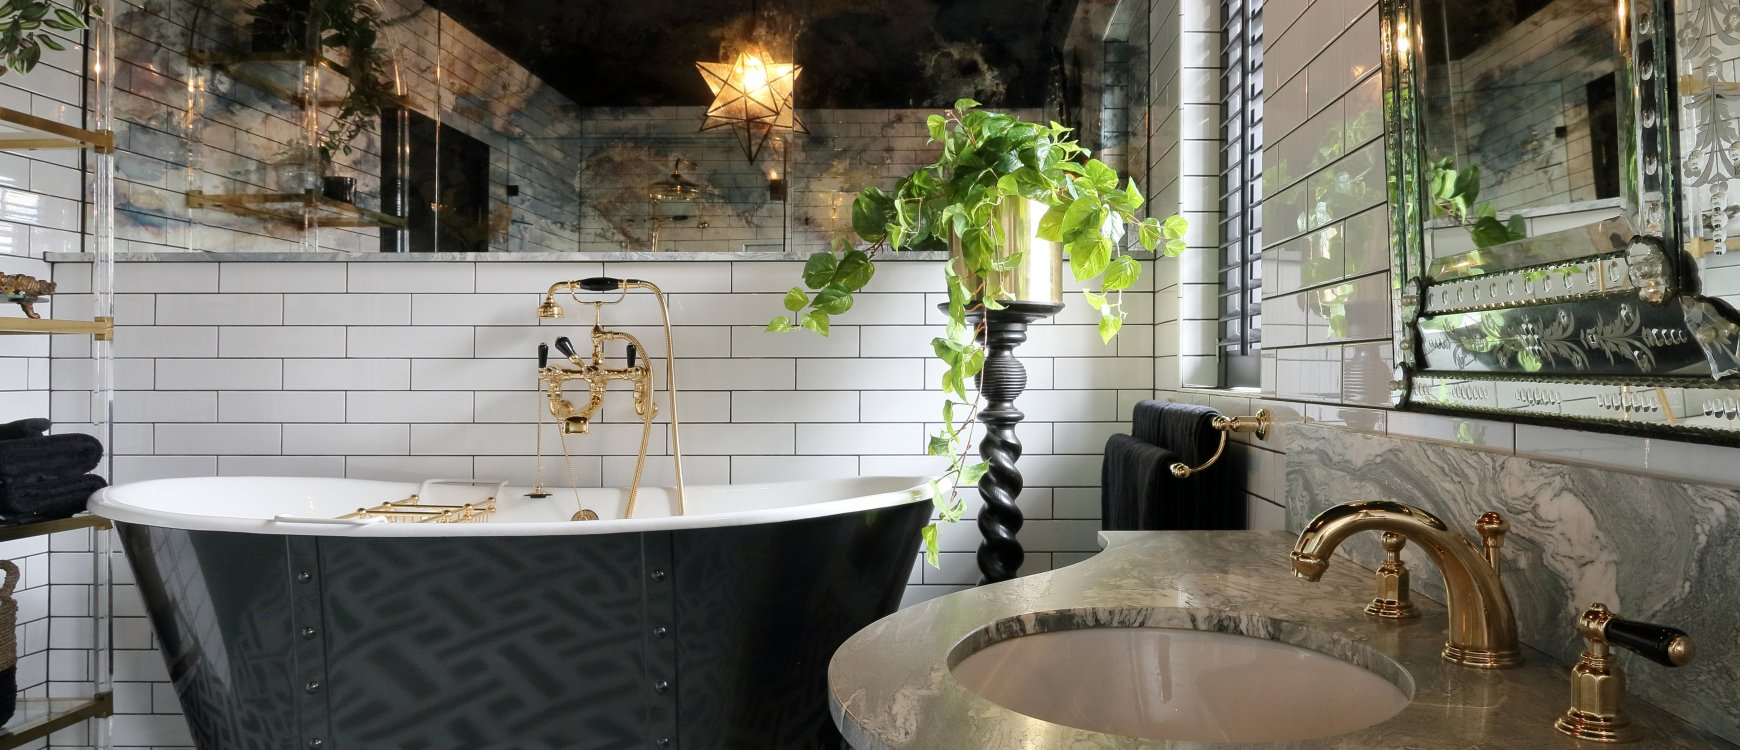 How To Get A Hollywood Regency Bathroom Inspiration Design Books Blog